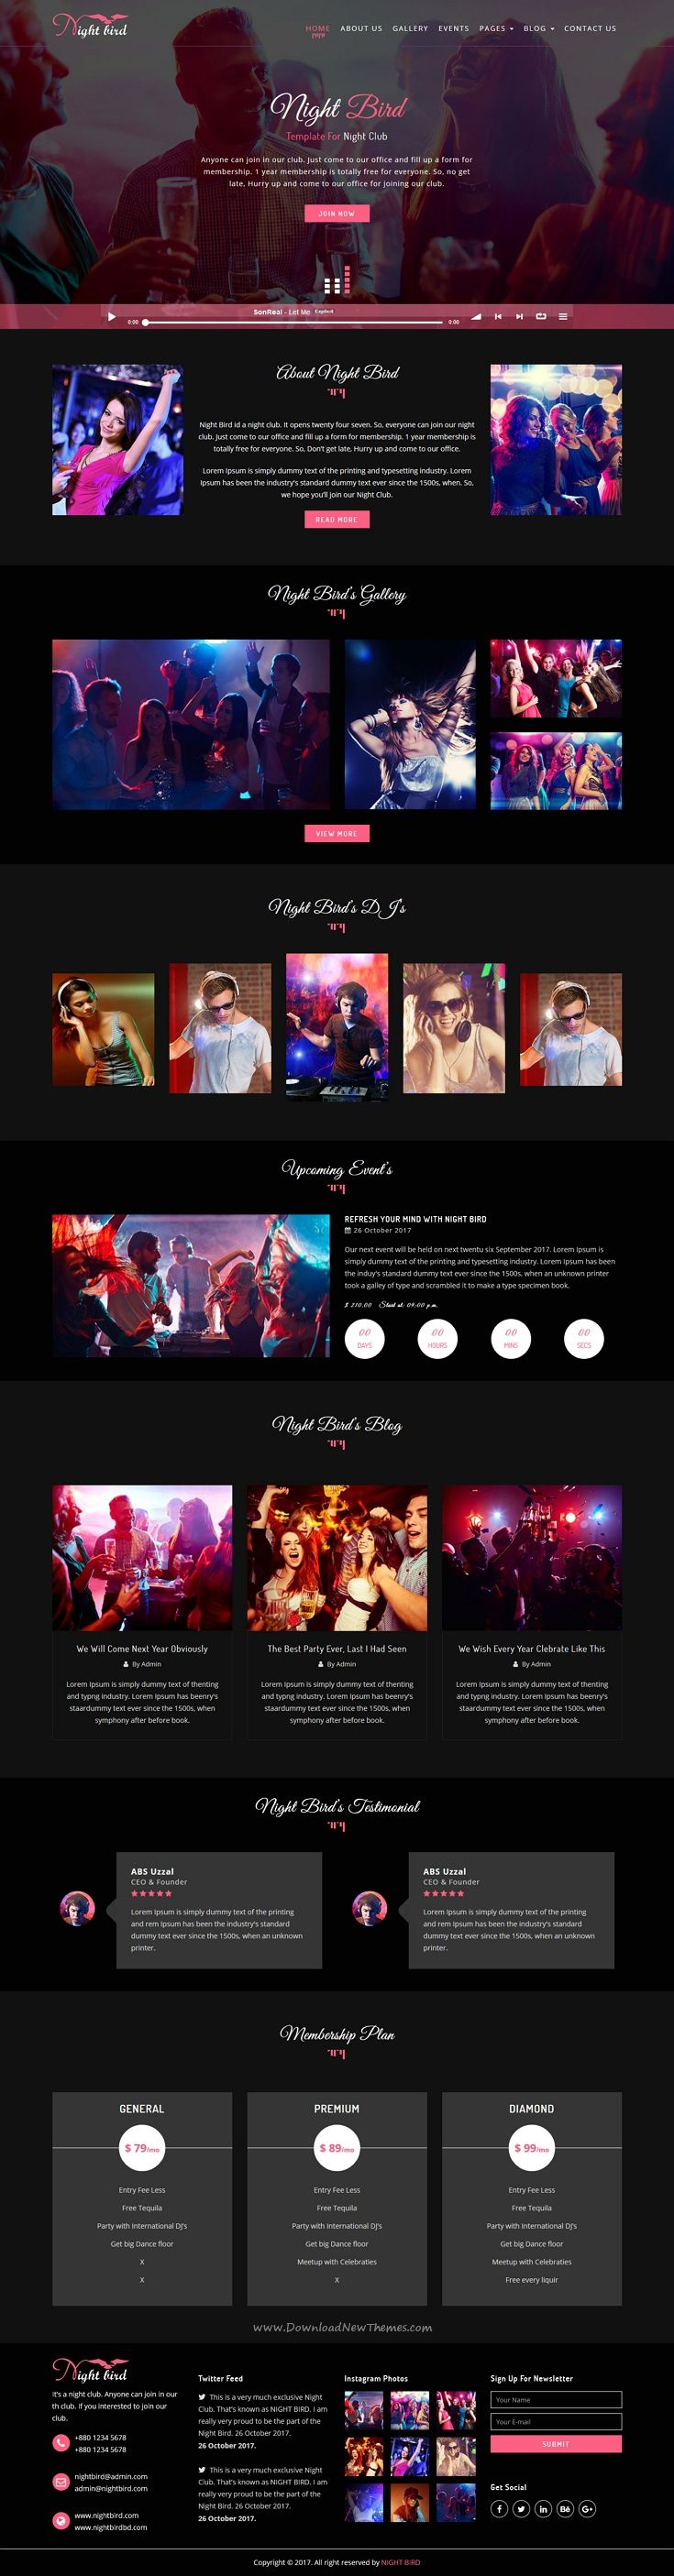 85 best music website images on Pinterest   Design web, Bands and ...